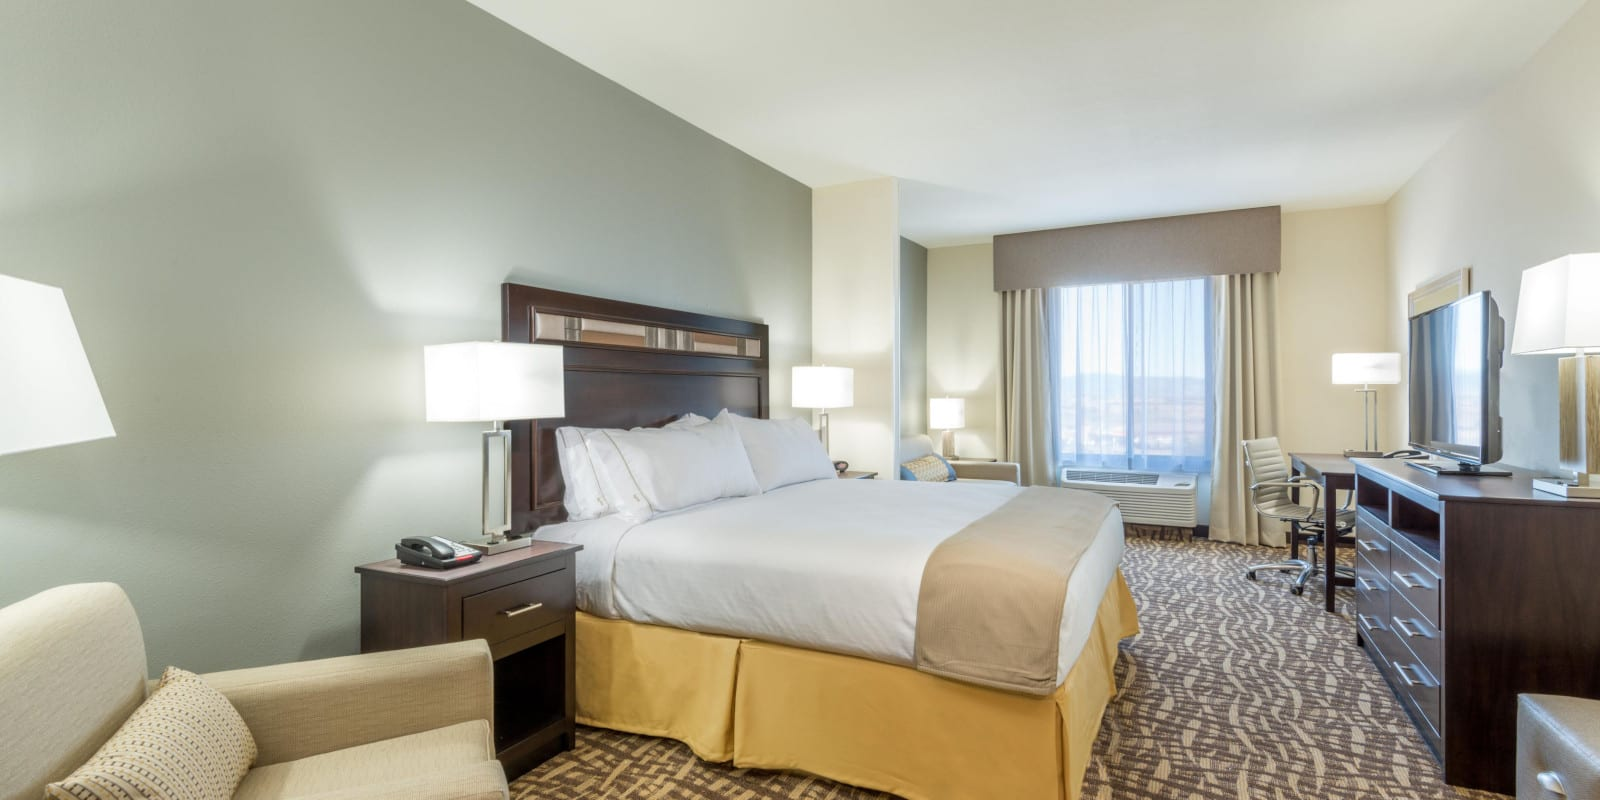 Best Hotel Castle Rock CO Holiday Inn Express Bedroom